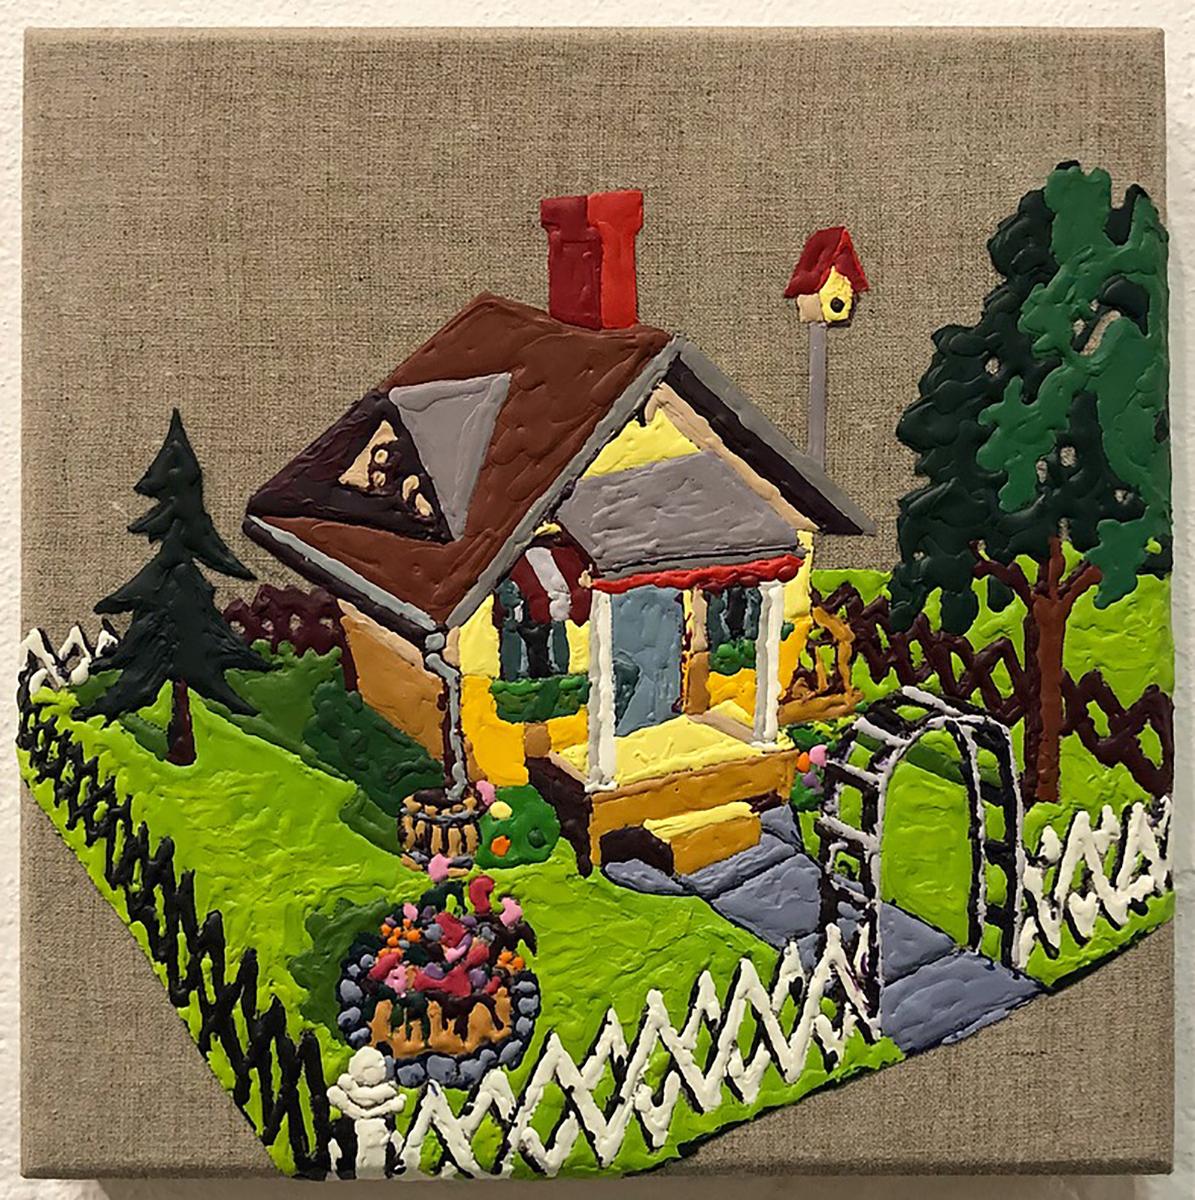 """lil homies"" by Waller Austin,crayon, gesso, linen, wood 12x12in, 2017,$900"